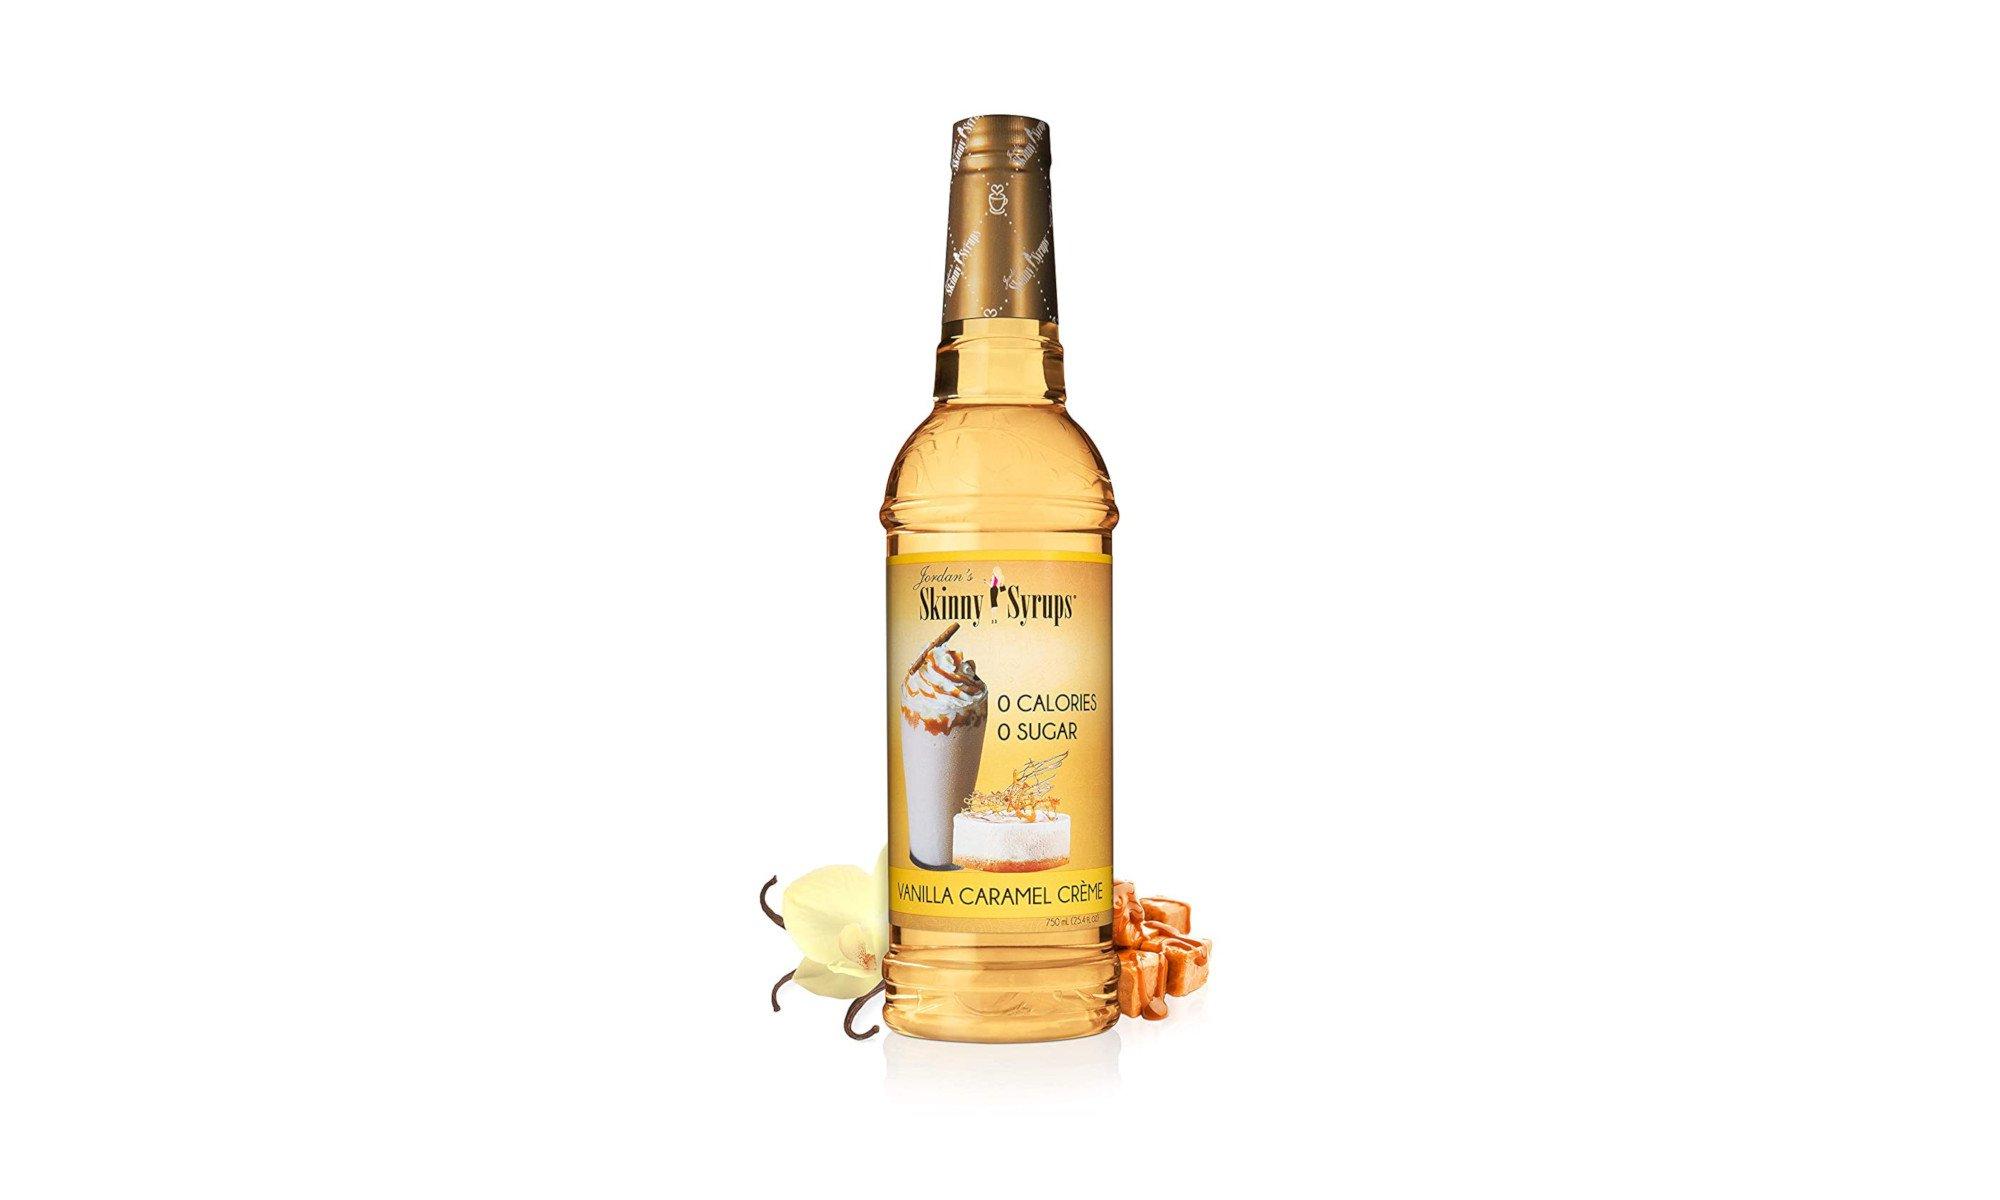 Jordan's Skinny Syrups Vanilla Caramel Crème